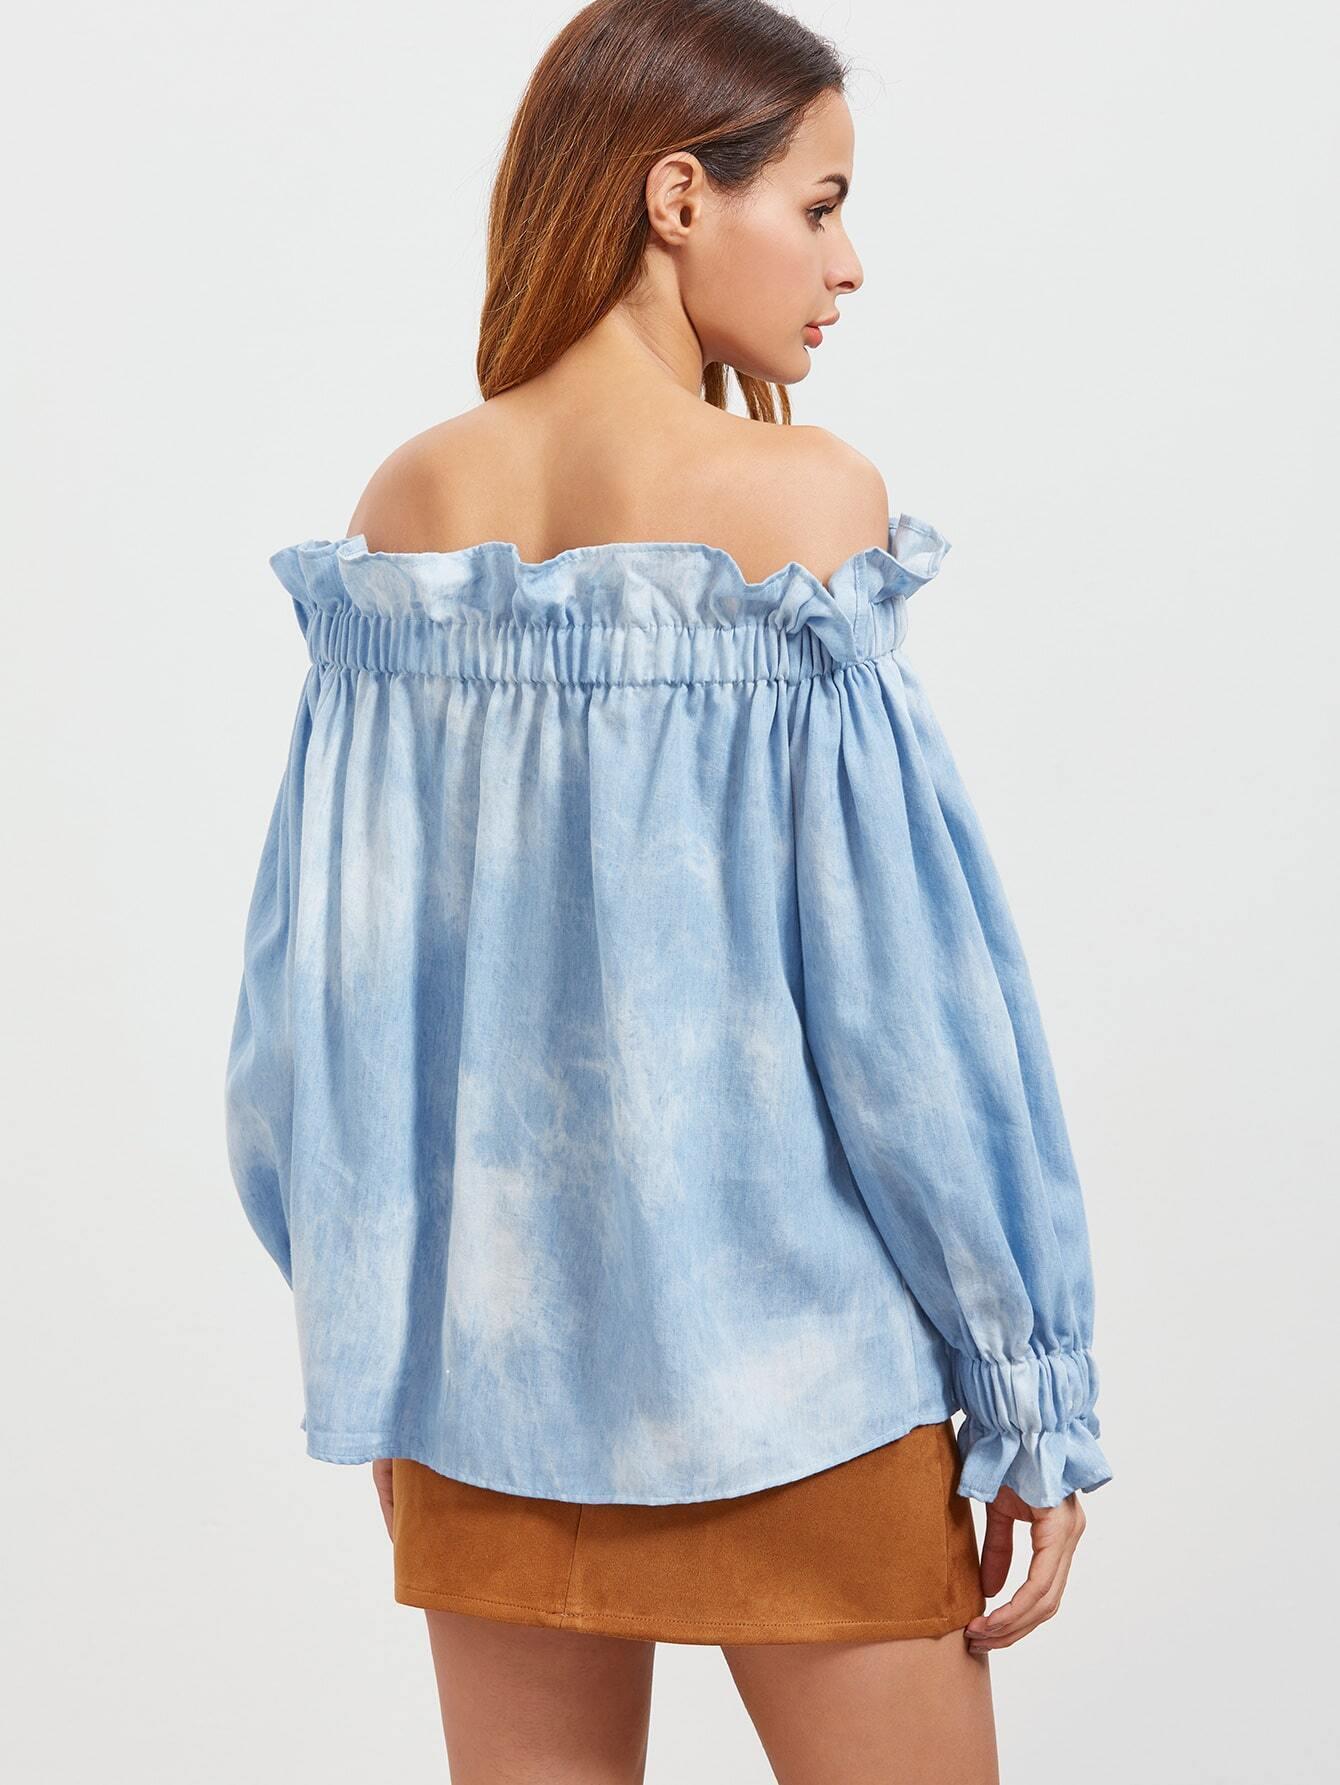 blouse170104451_2